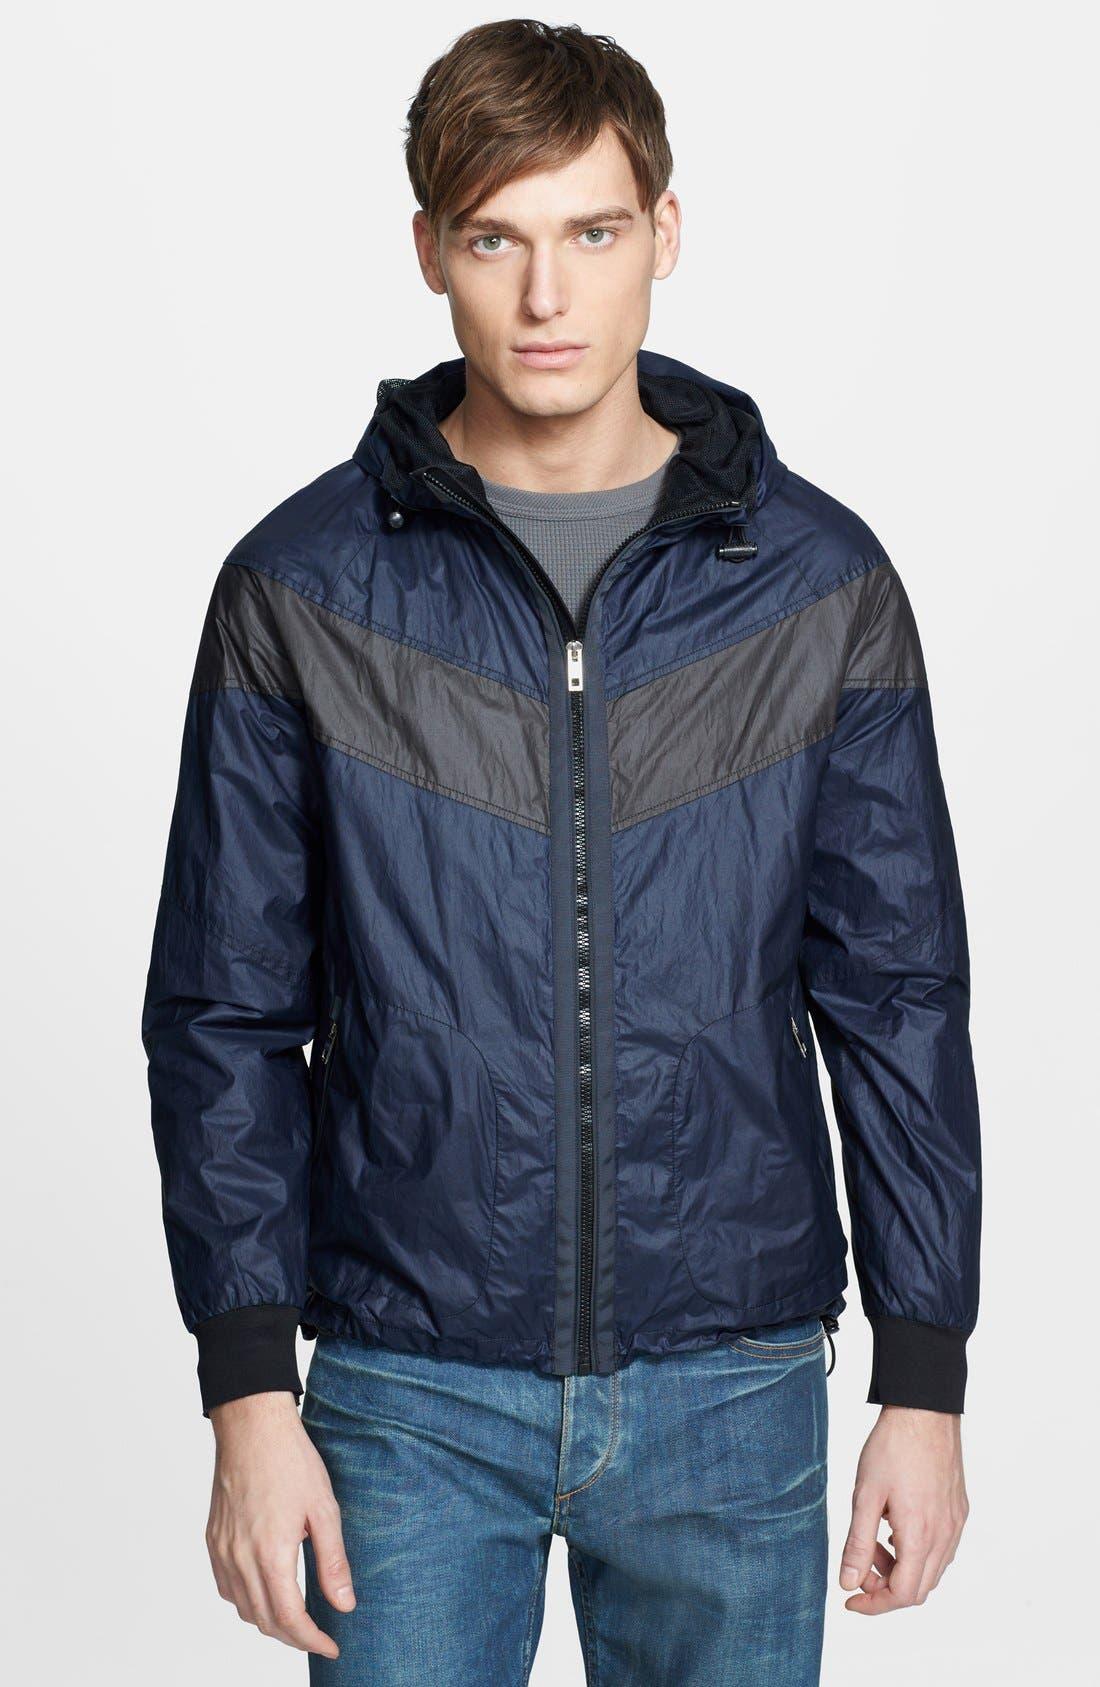 Alternate Image 1 Selected - rag & bone 'Terrace' Lightweight Hooded Jacket